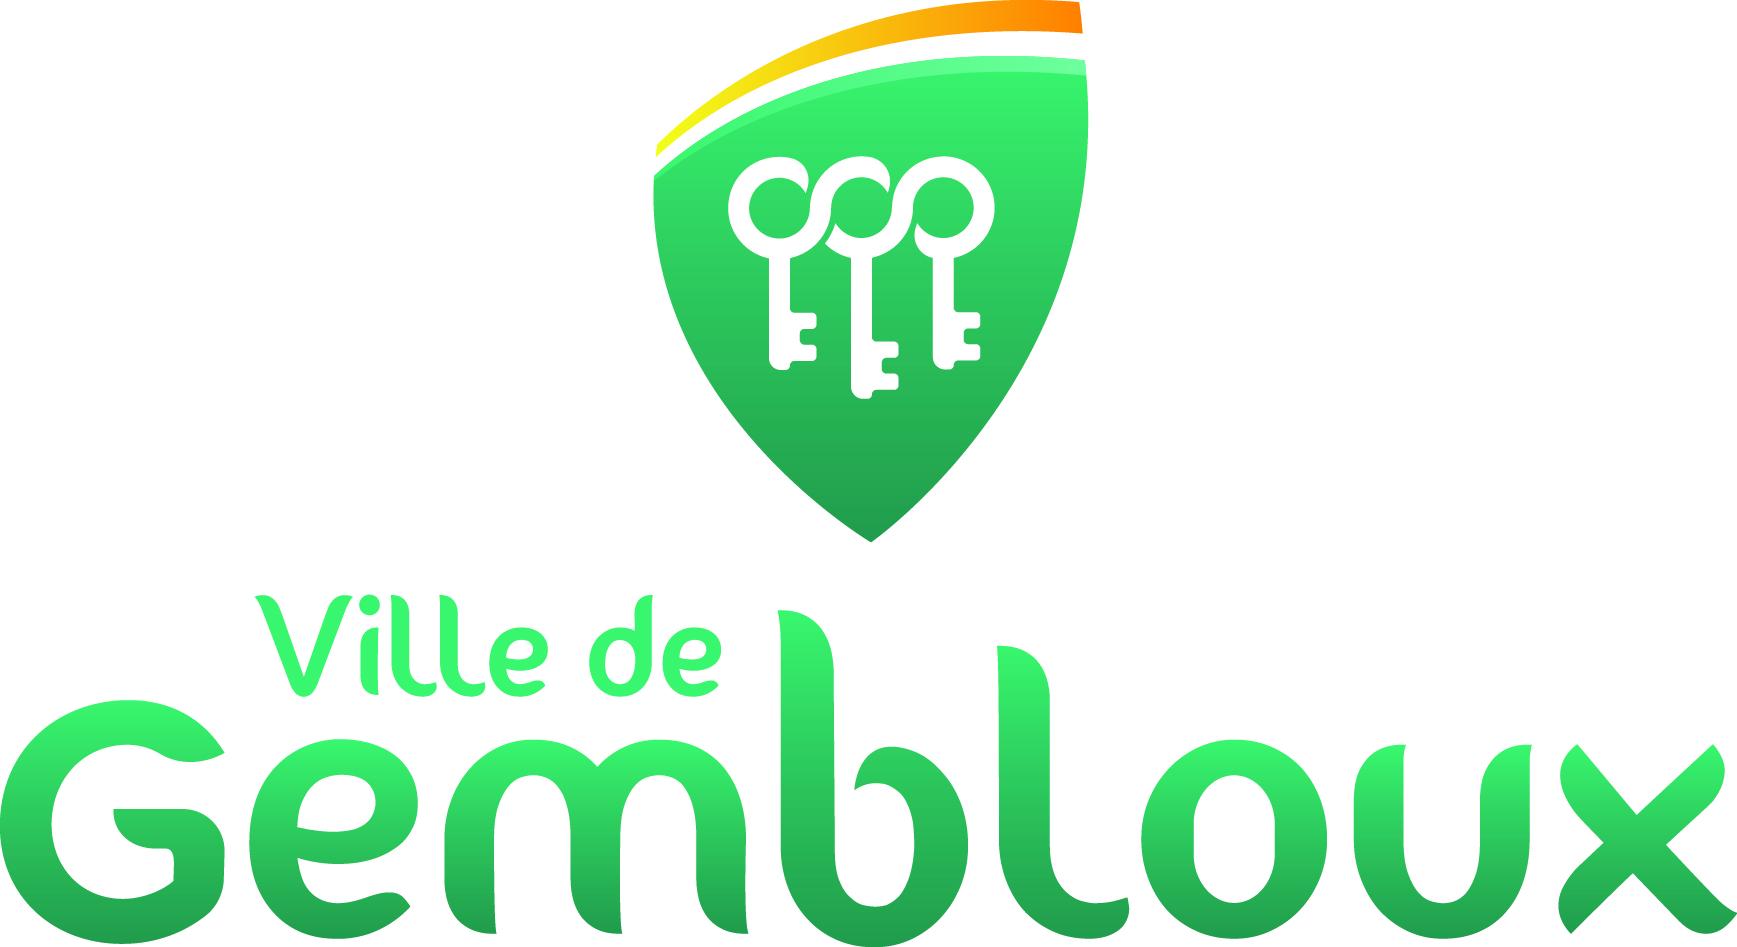 Logo ok jpg